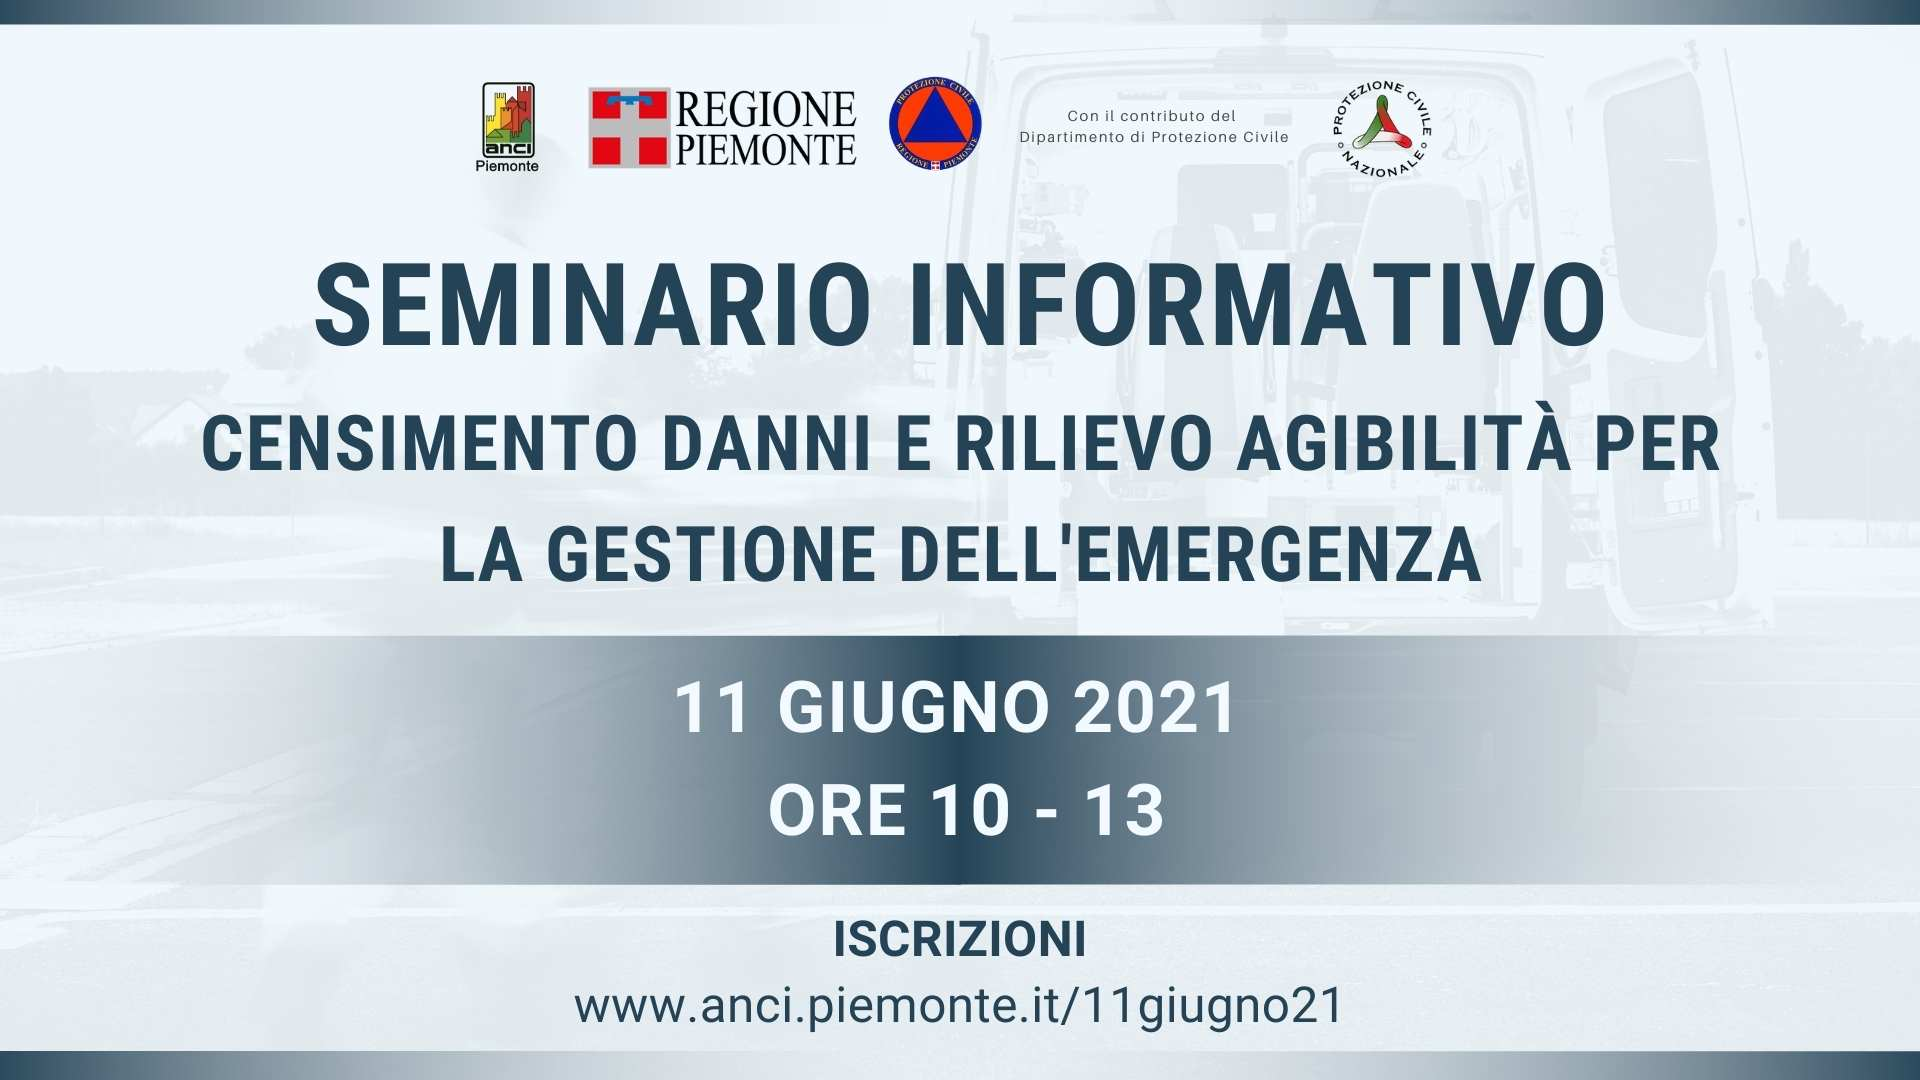 Seminario informativo v2 (1)